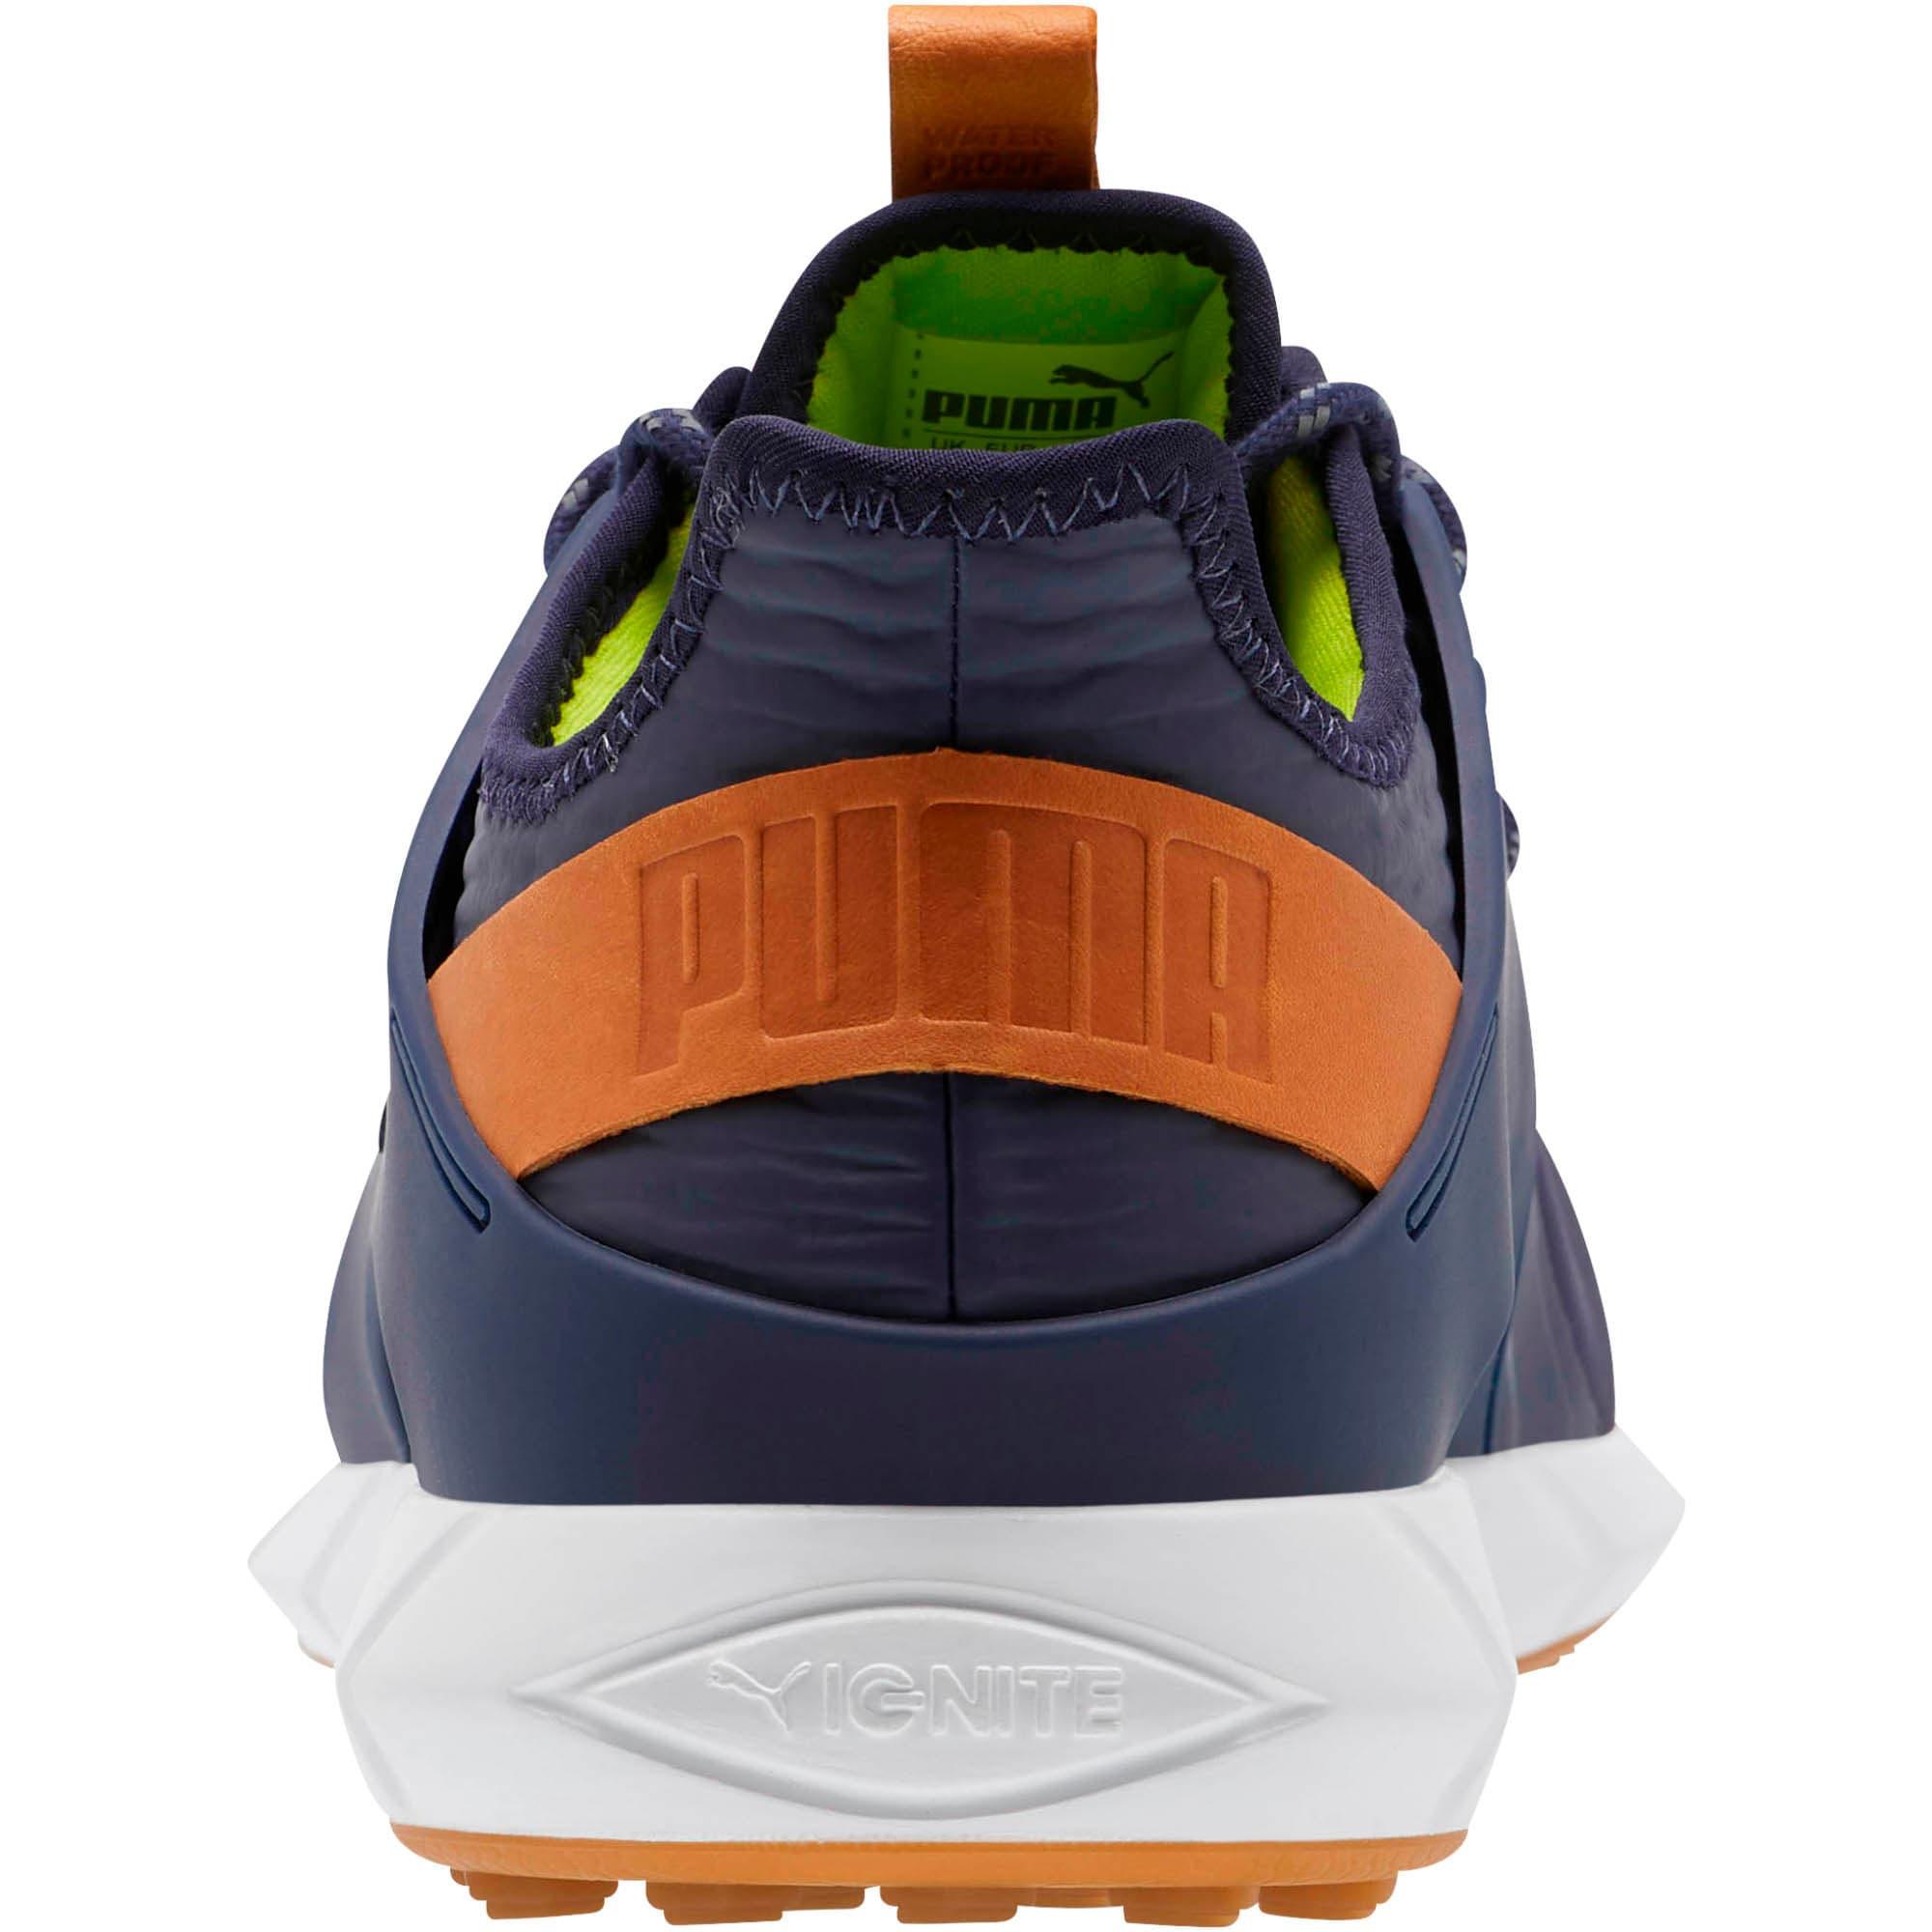 Thumbnail 3 of IGNITE PWRSPORT Men's Golf Shoes, Peacoat-Silver, medium